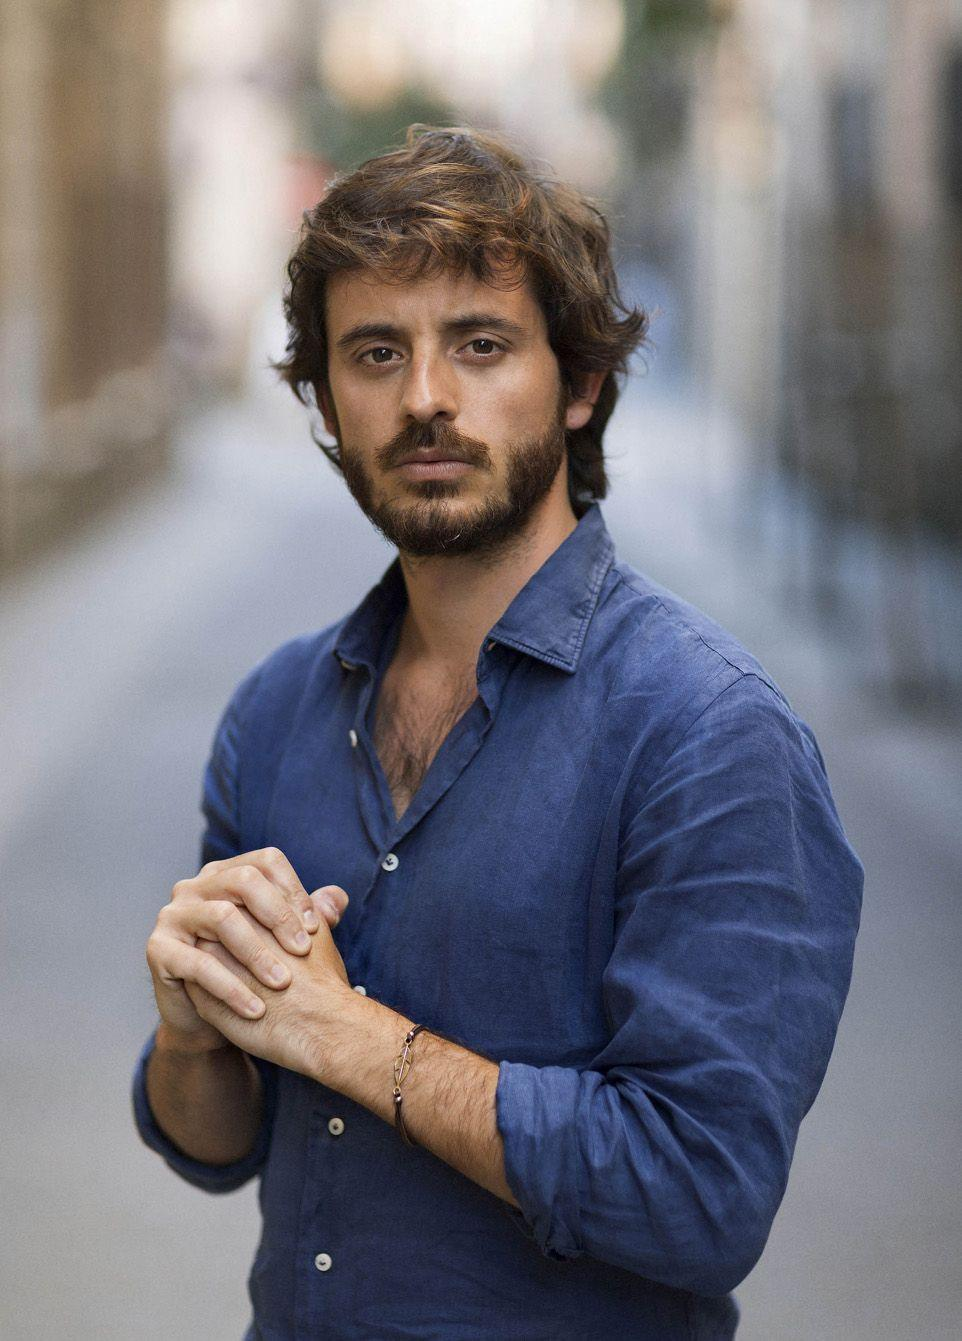 D. Javier Pereira Collado